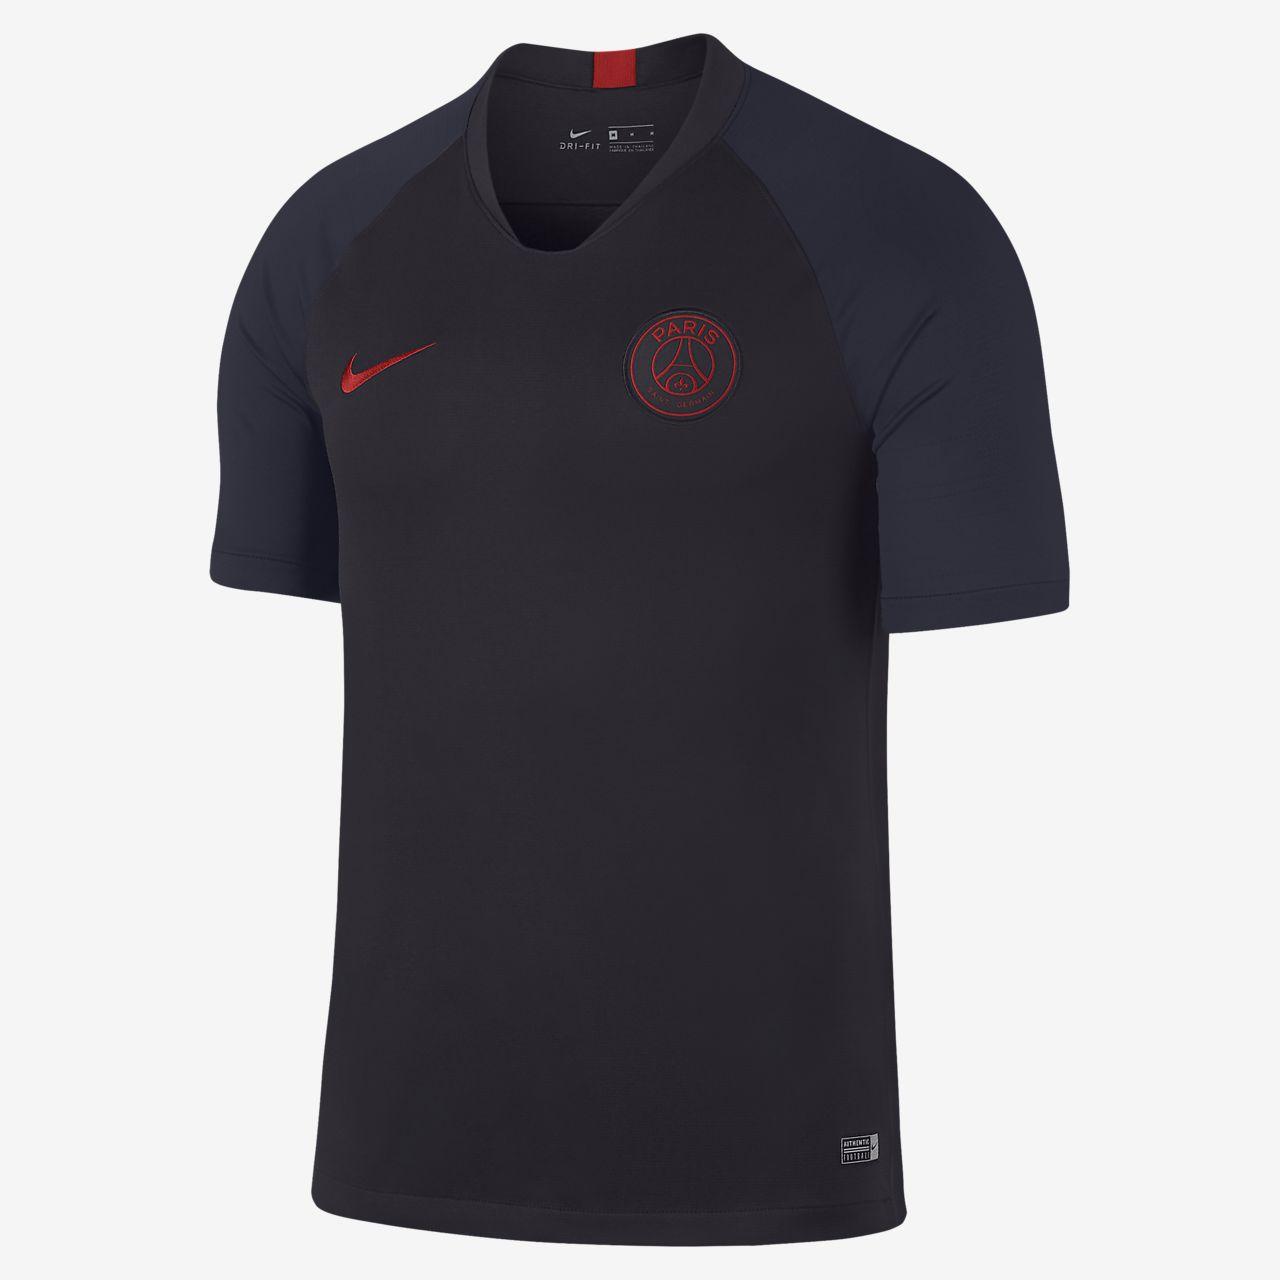 Prenda para la parte superior de fútbol de manga corta para hombre Nike Breathe Paris Saint-Germain Strike